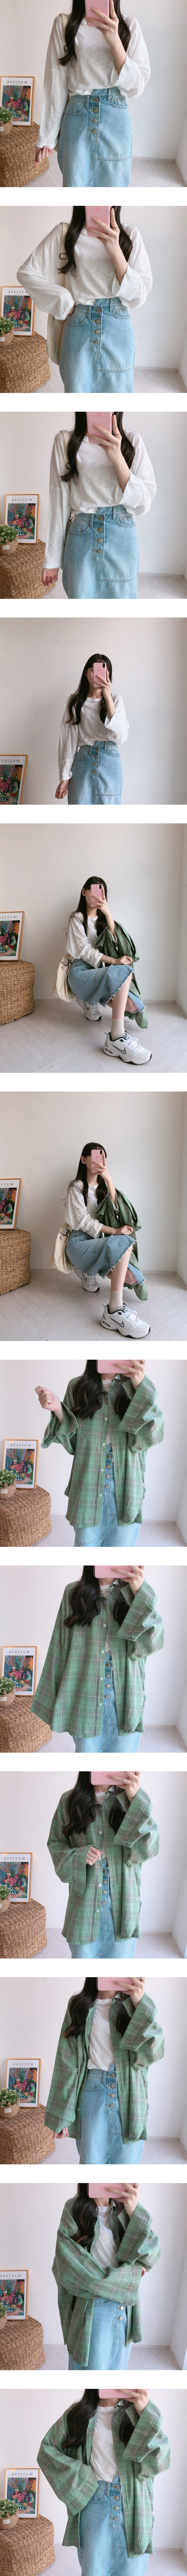 Loel denim incised uncut skirt